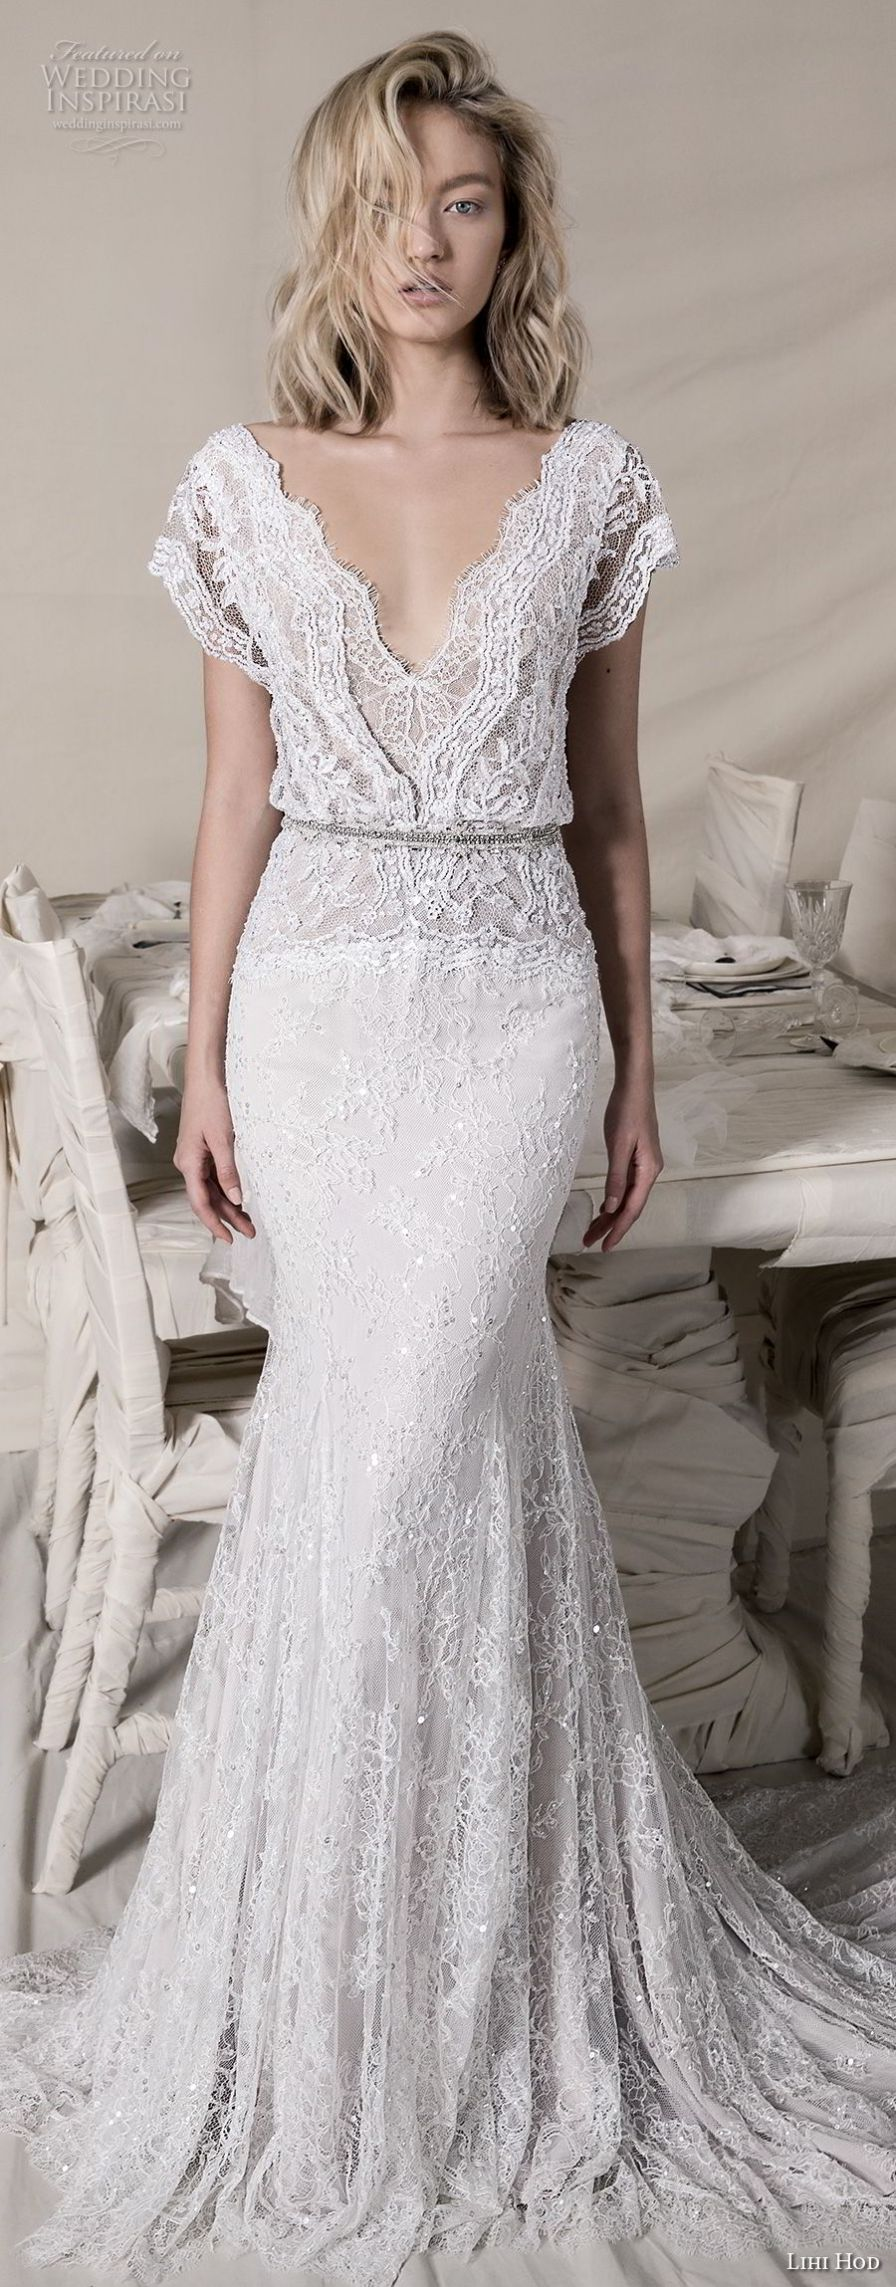 Lihi hod fall wedding dresses wedding ideas pinterest